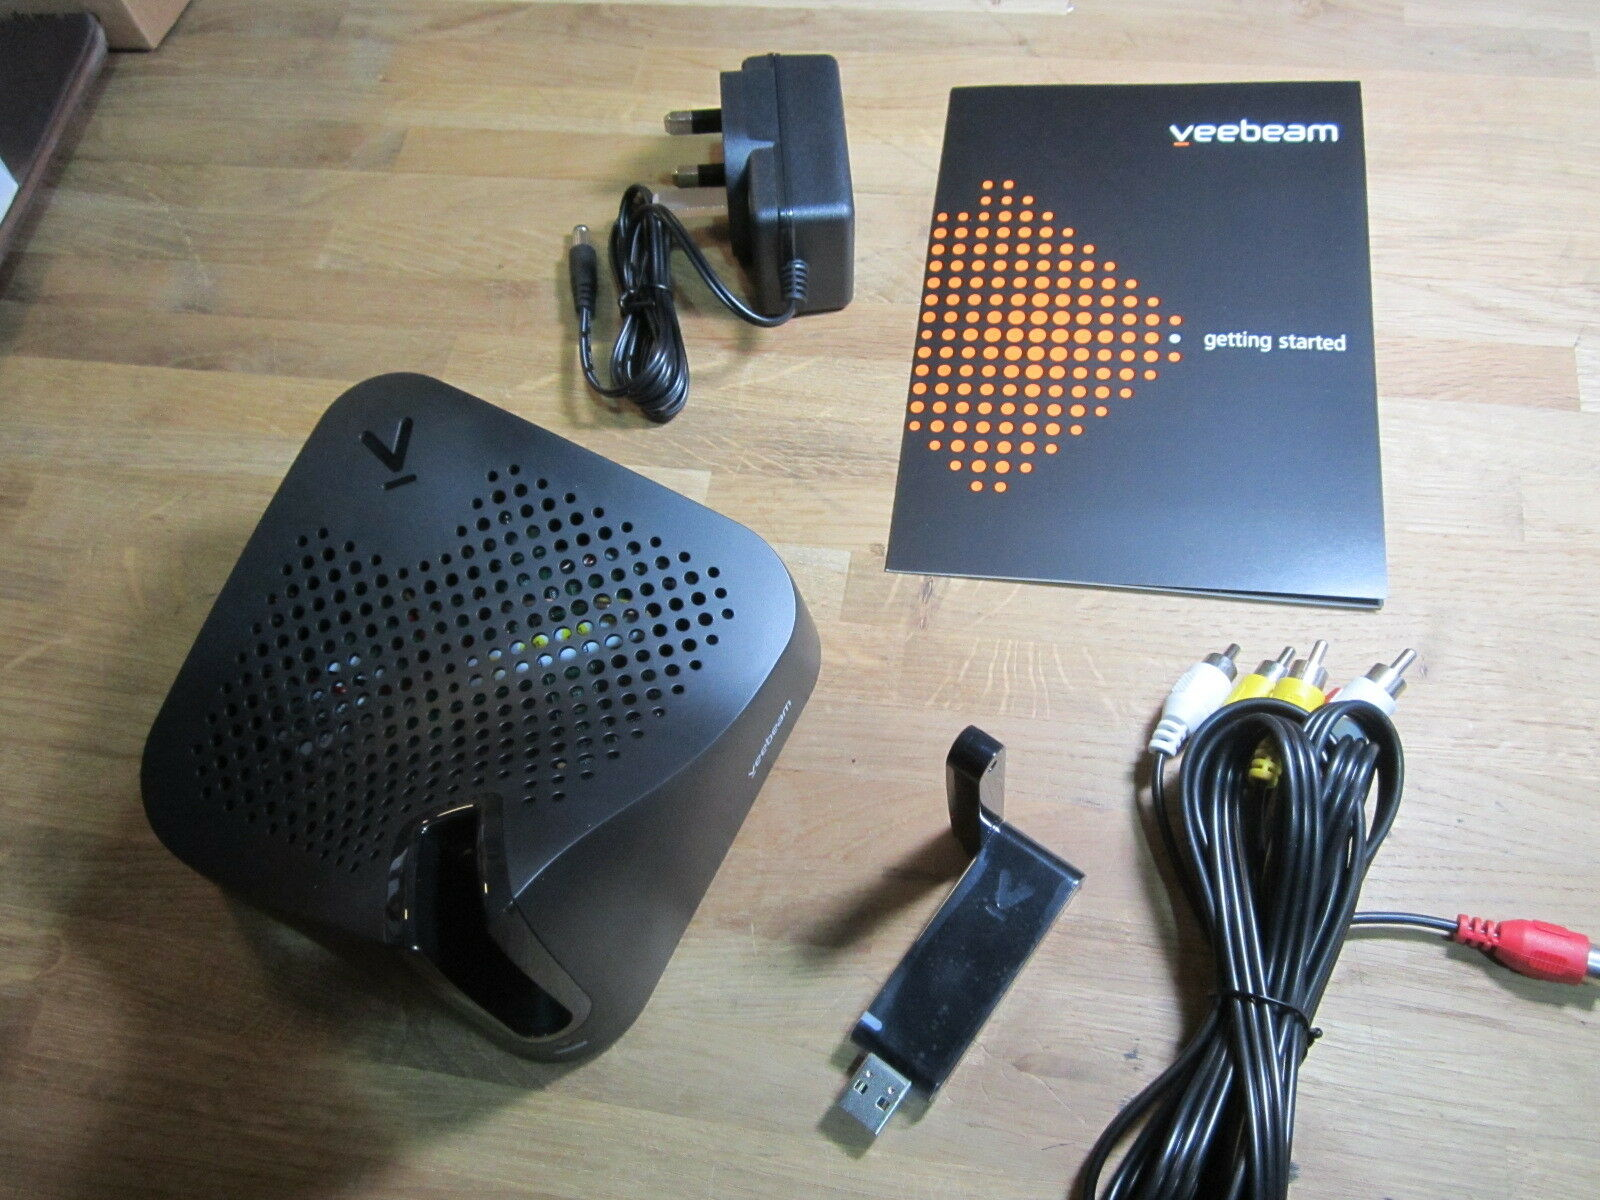 Veebeam Vb02b Eu Hd Wireless Laptop Pc To Tv Hdmi Composite Hdtv Wiring Diagram 24ghz Link Screencast